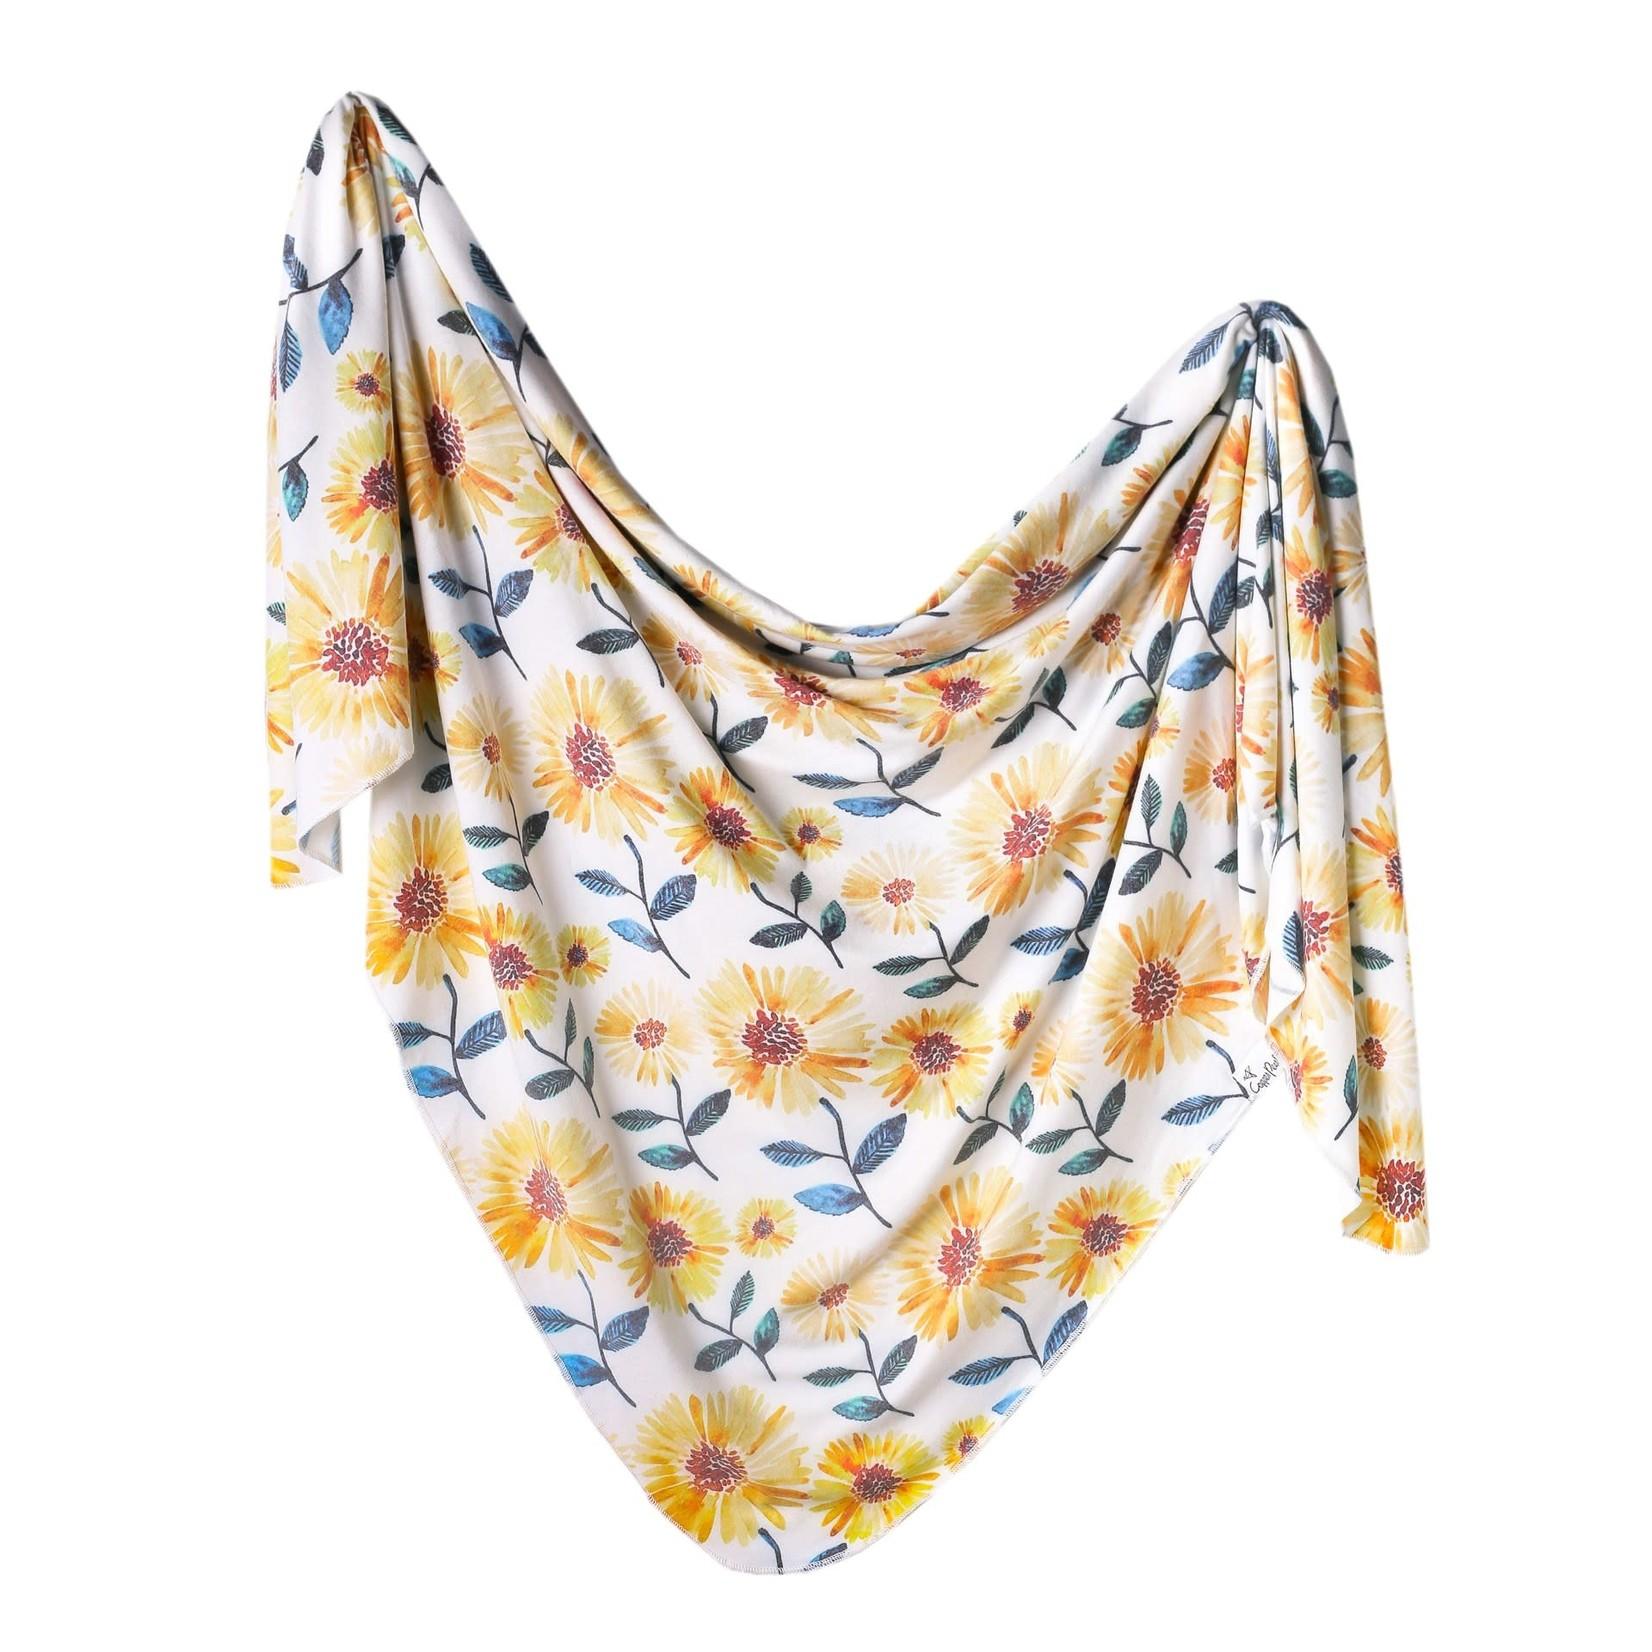 Copper Pearl Knit Blanket - Sunnie